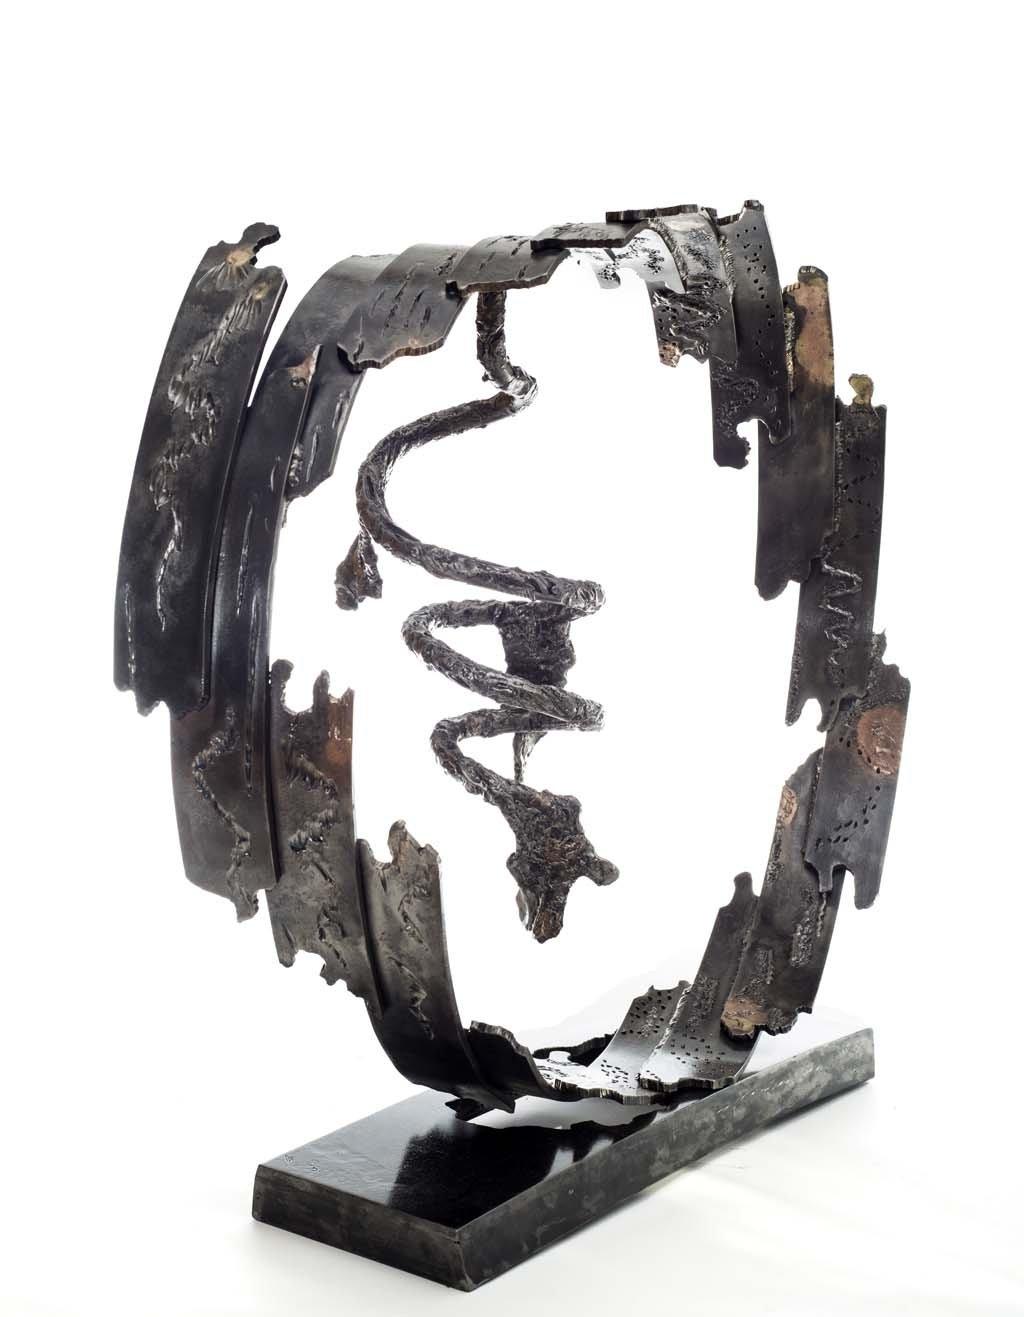 Insights VII | 2014 | Iron & brass sculpture | 85x96x40 cm | Rami Ater